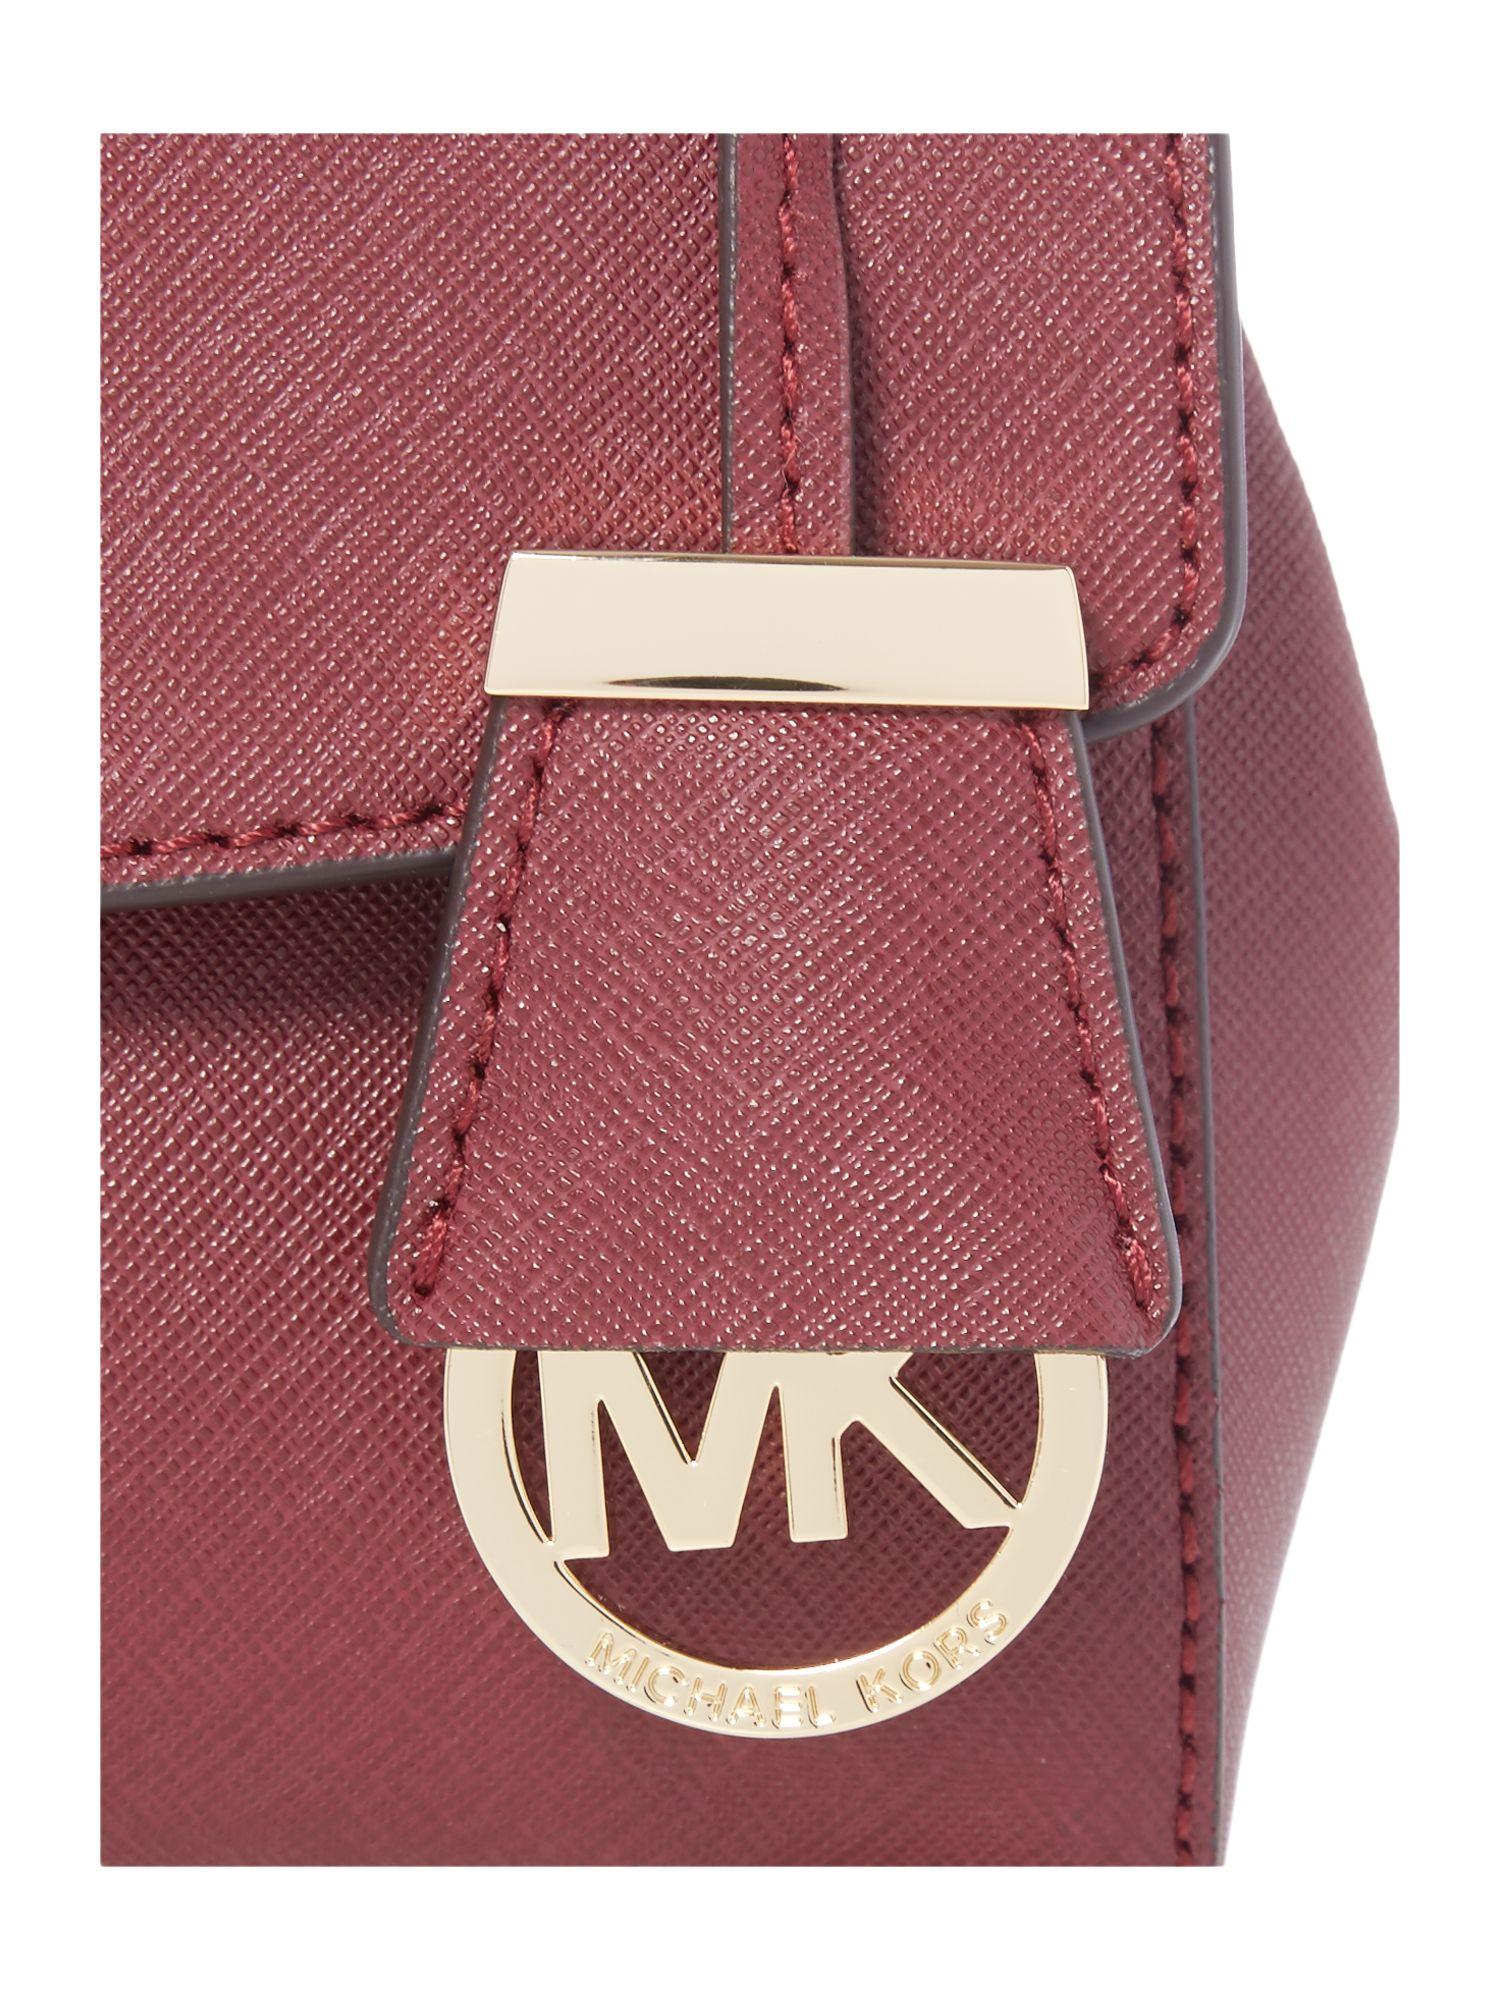 Michael kors Ava Burgundy Mini Satchel Bag in Purple | Lyst